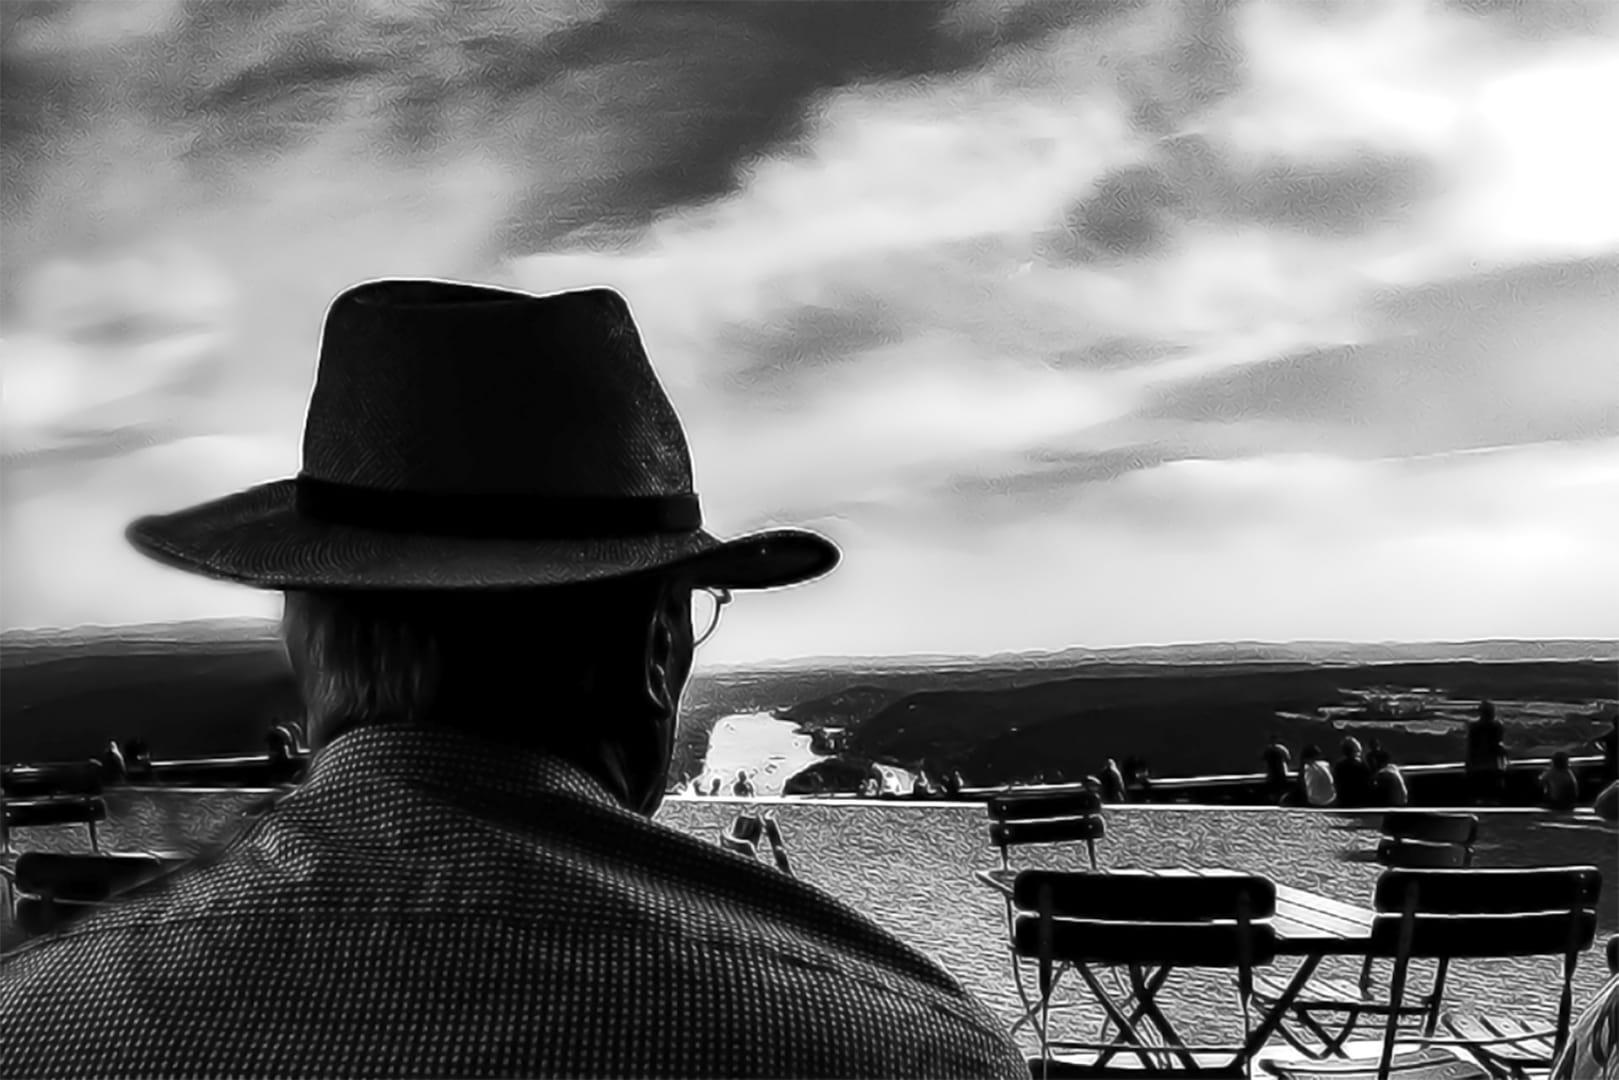 mirant l'horitzó